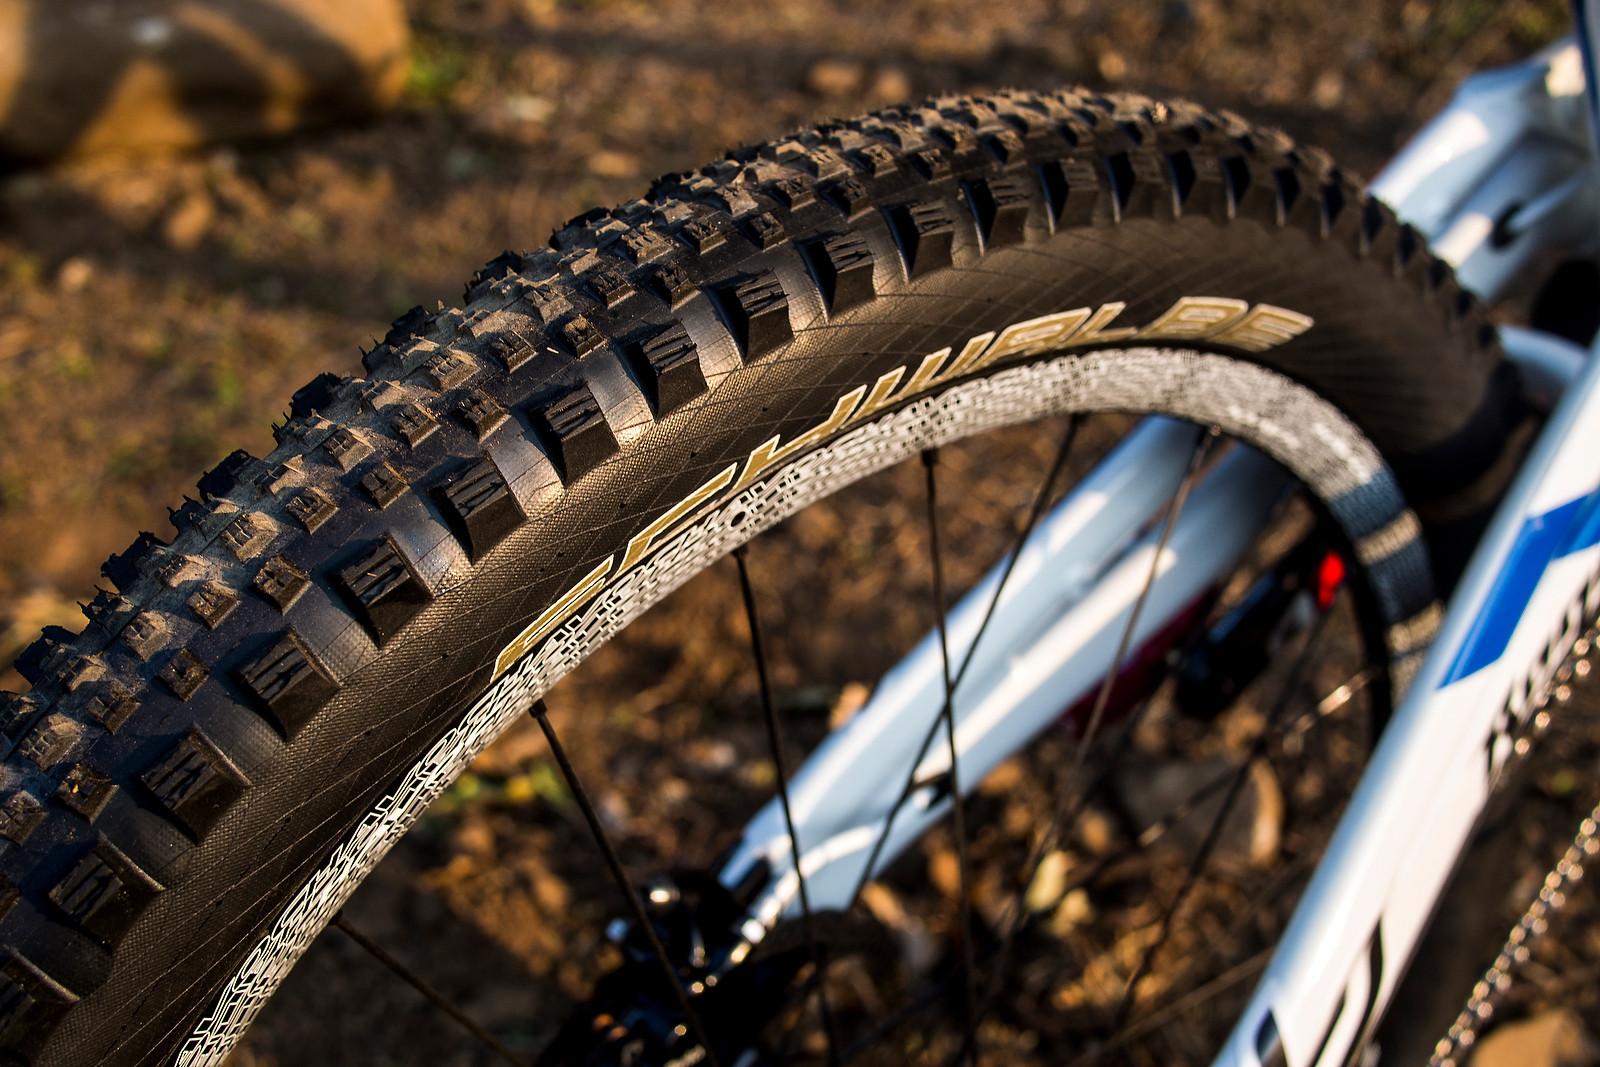 Schwalbe Rock Razor DH Tire for World Champs - WORLD CHAMPS BIKE - Emmeline Ragot's Lapierre DH 720 - Mountain Biking Pictures - Vital MTB